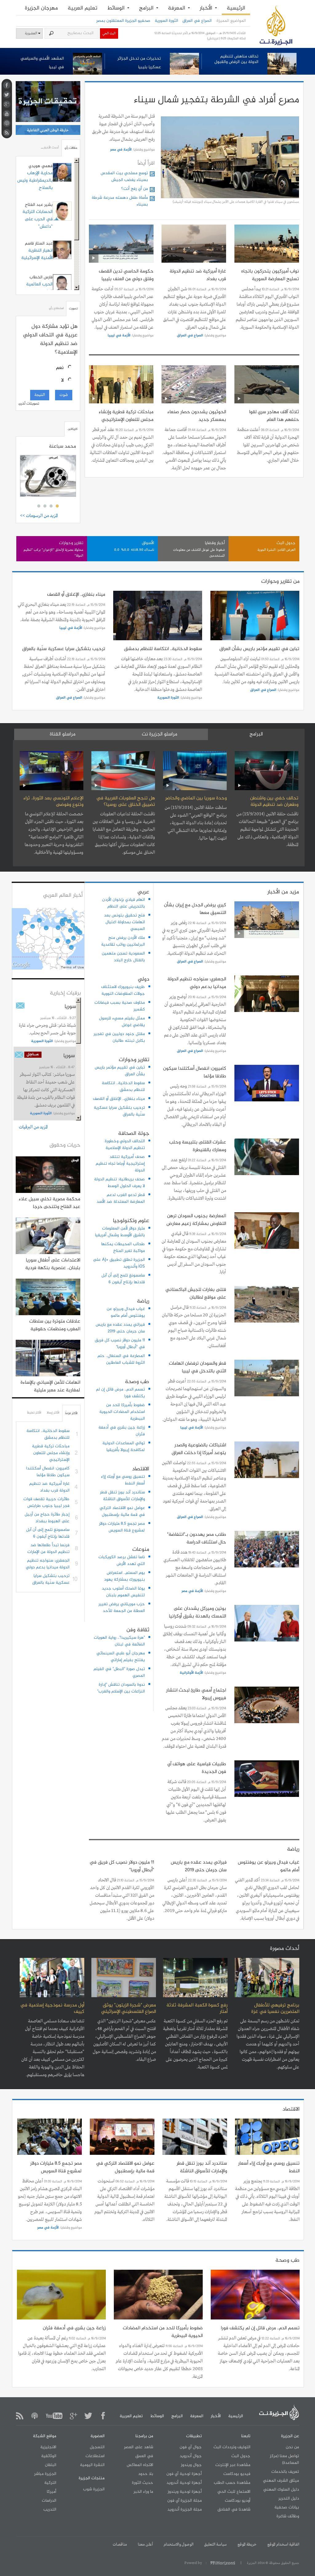 Al Jazeera at Tuesday Sept. 16, 2014, 10:07 a.m. UTC